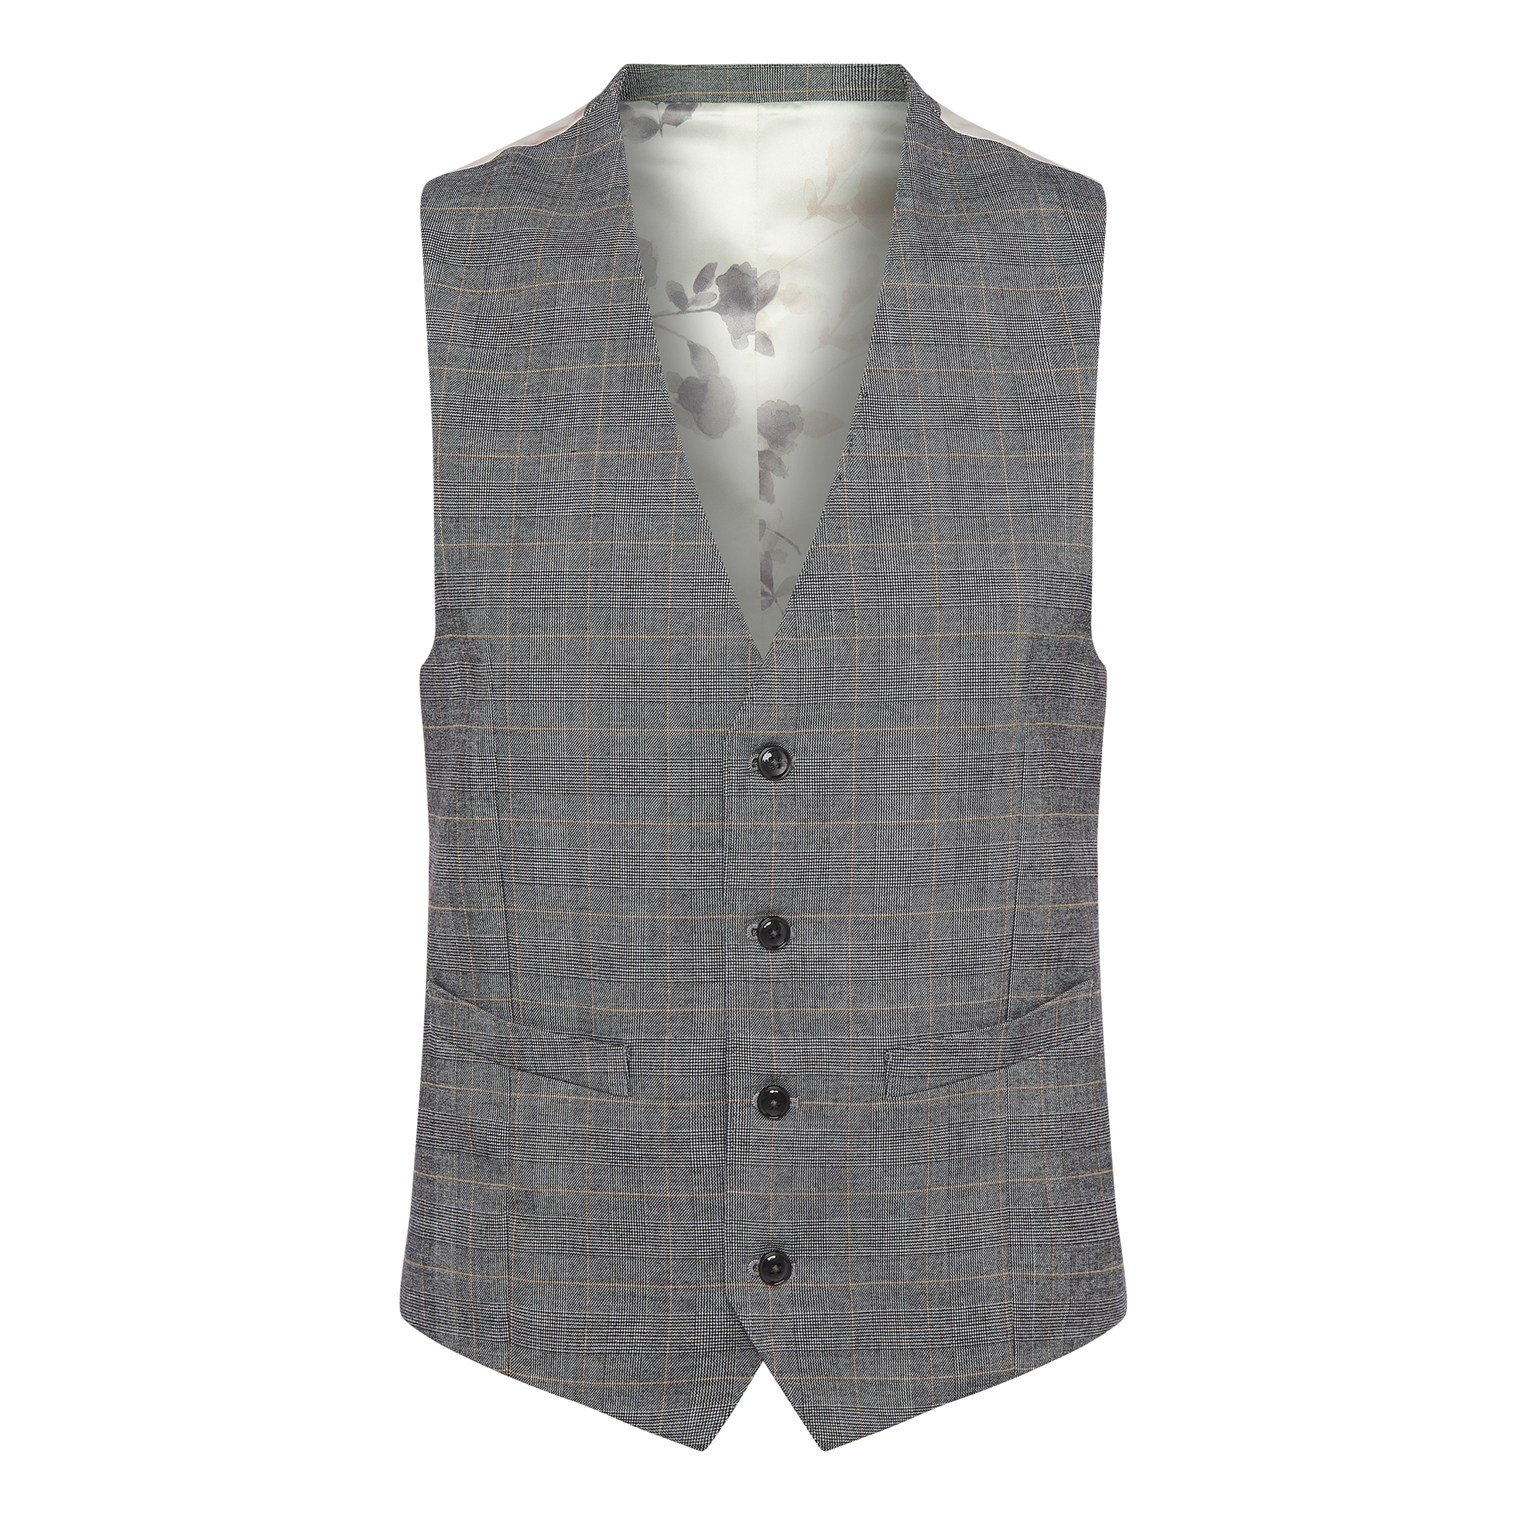 image-Grey Check Suit Waistcoat - grey check regular